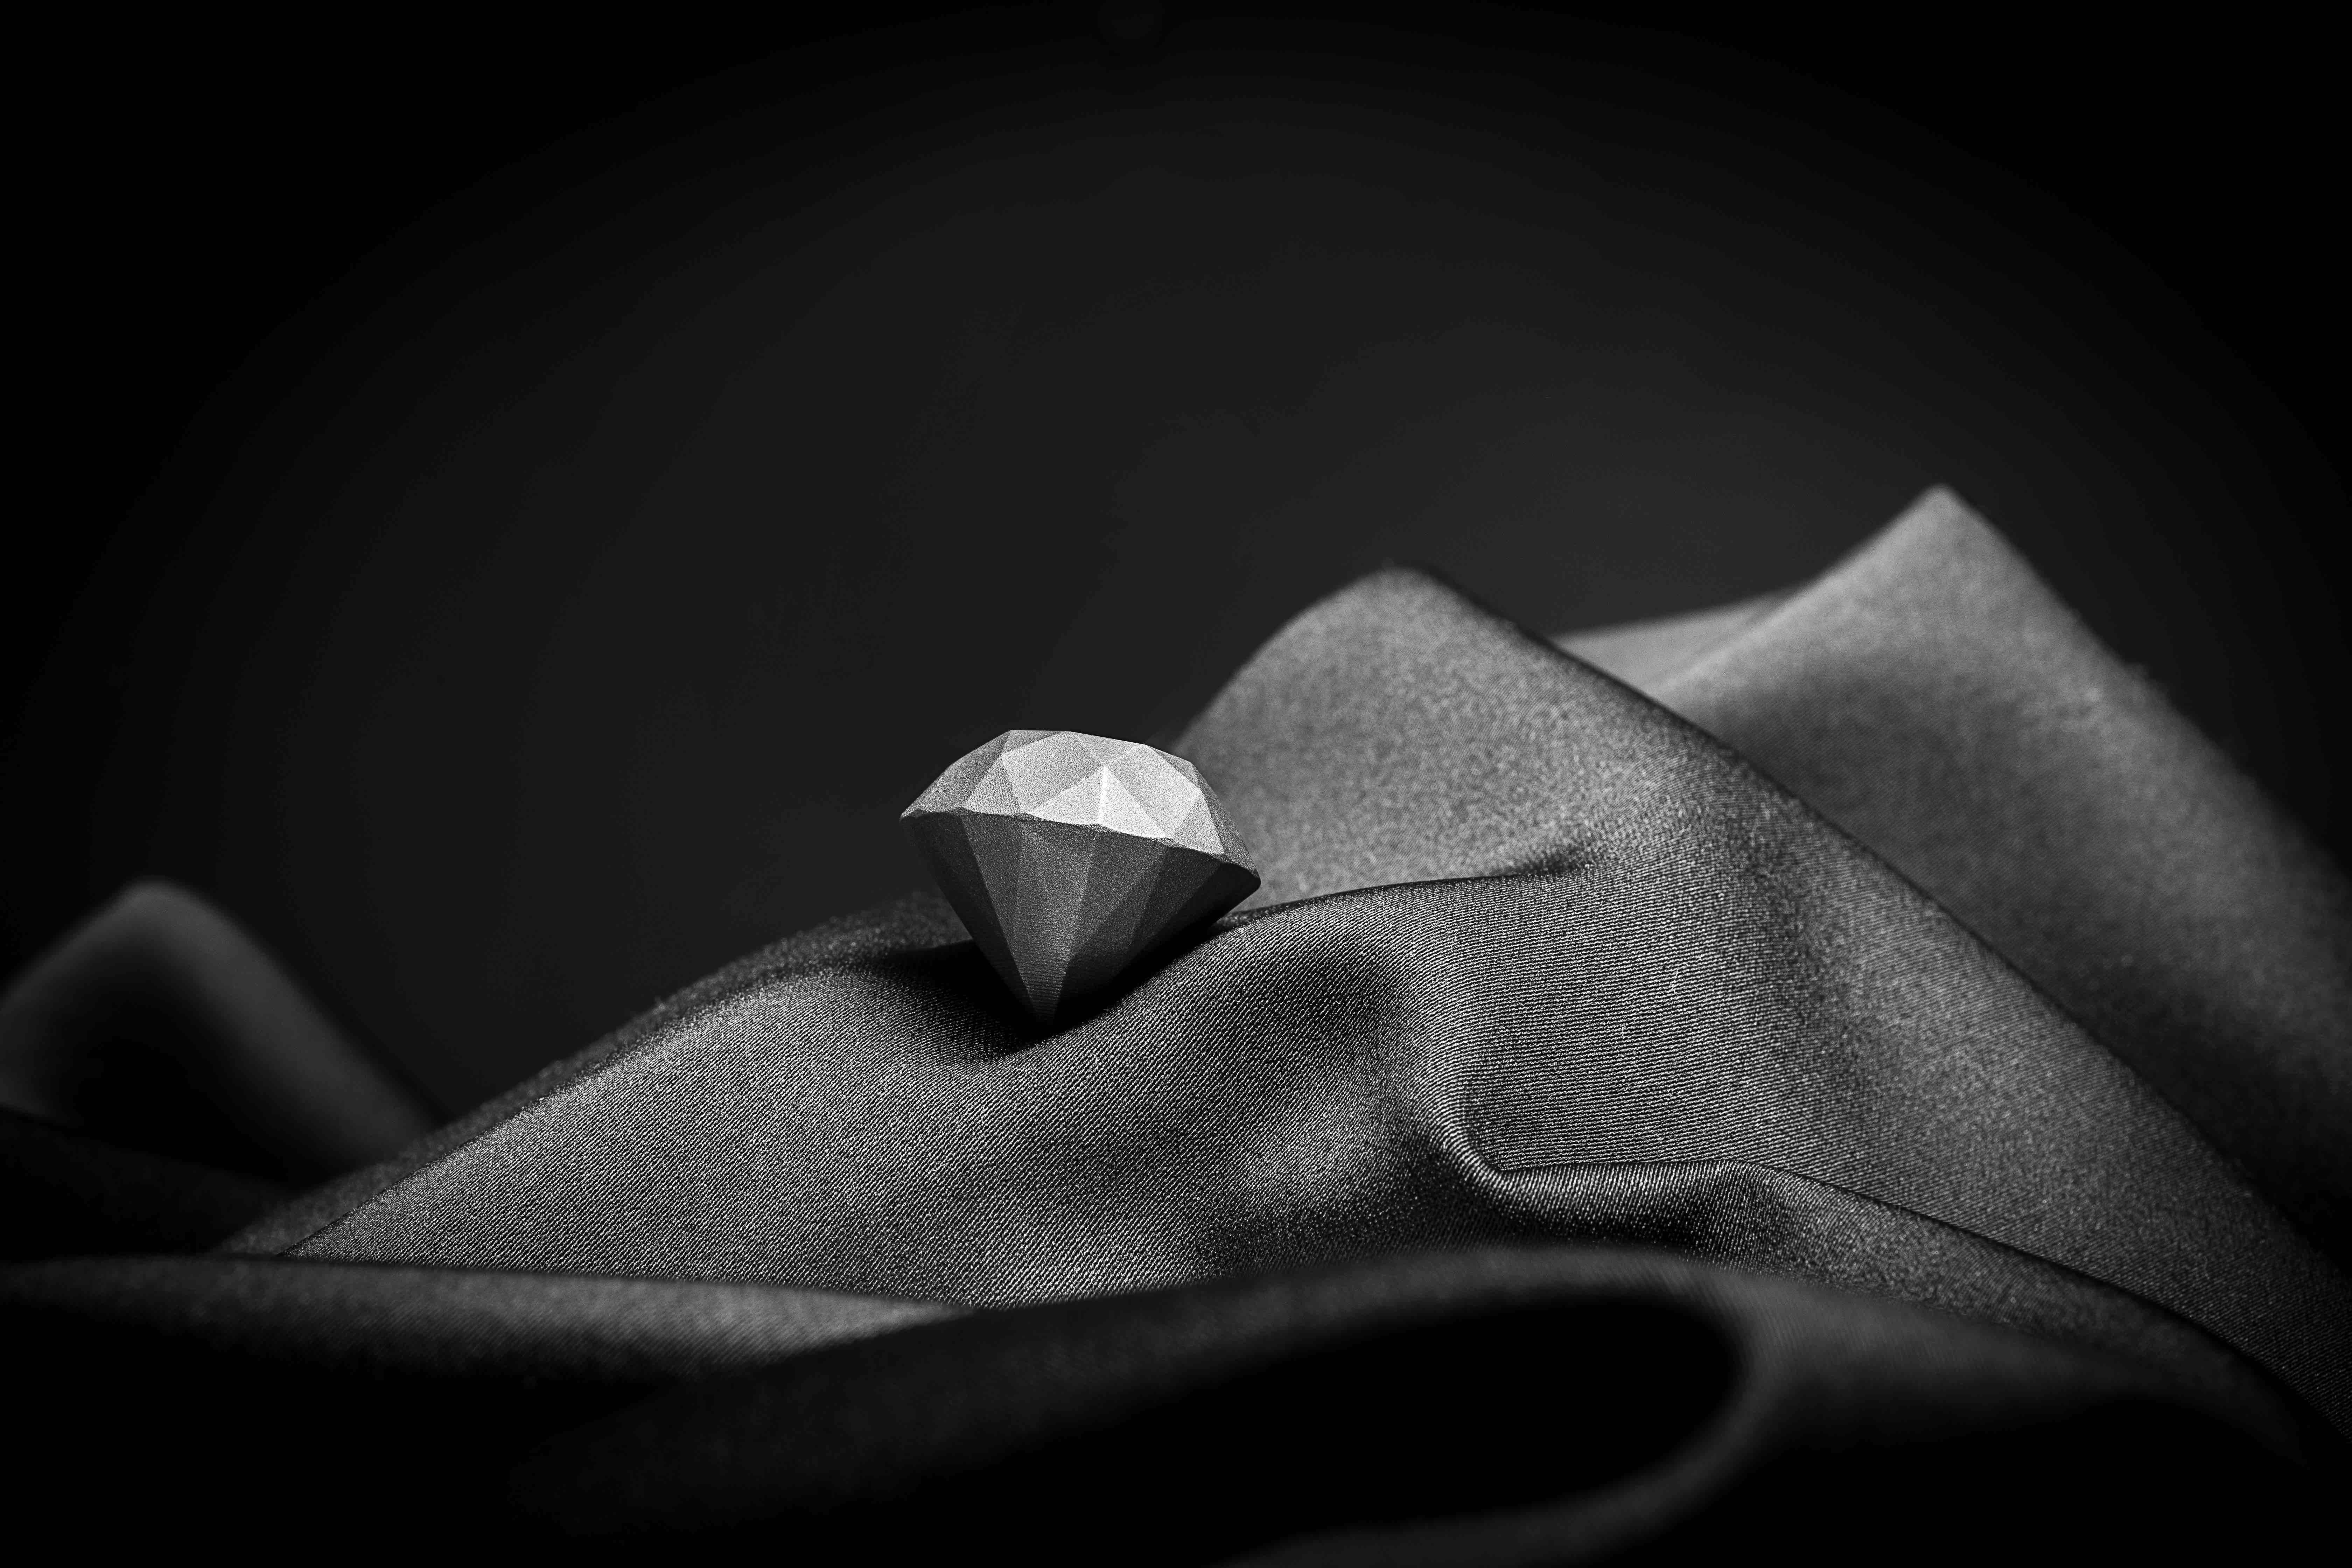 3D printed industrial diamond